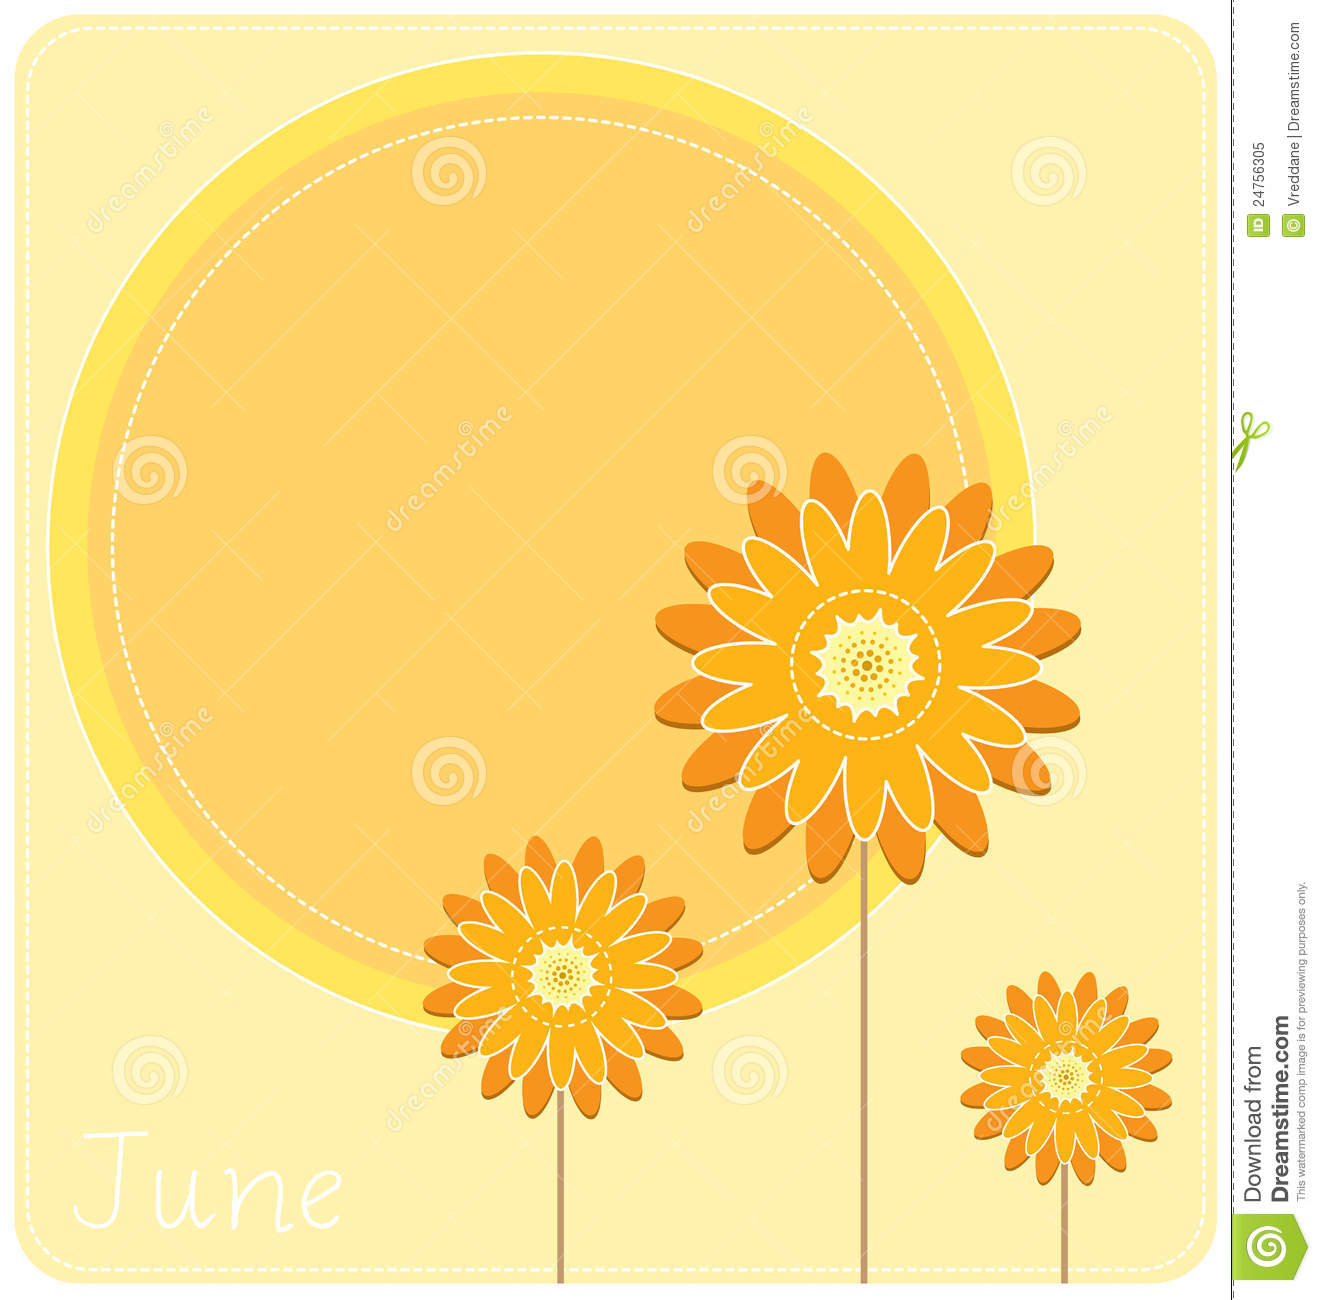 June Background stock vector. Illustration of pastel.